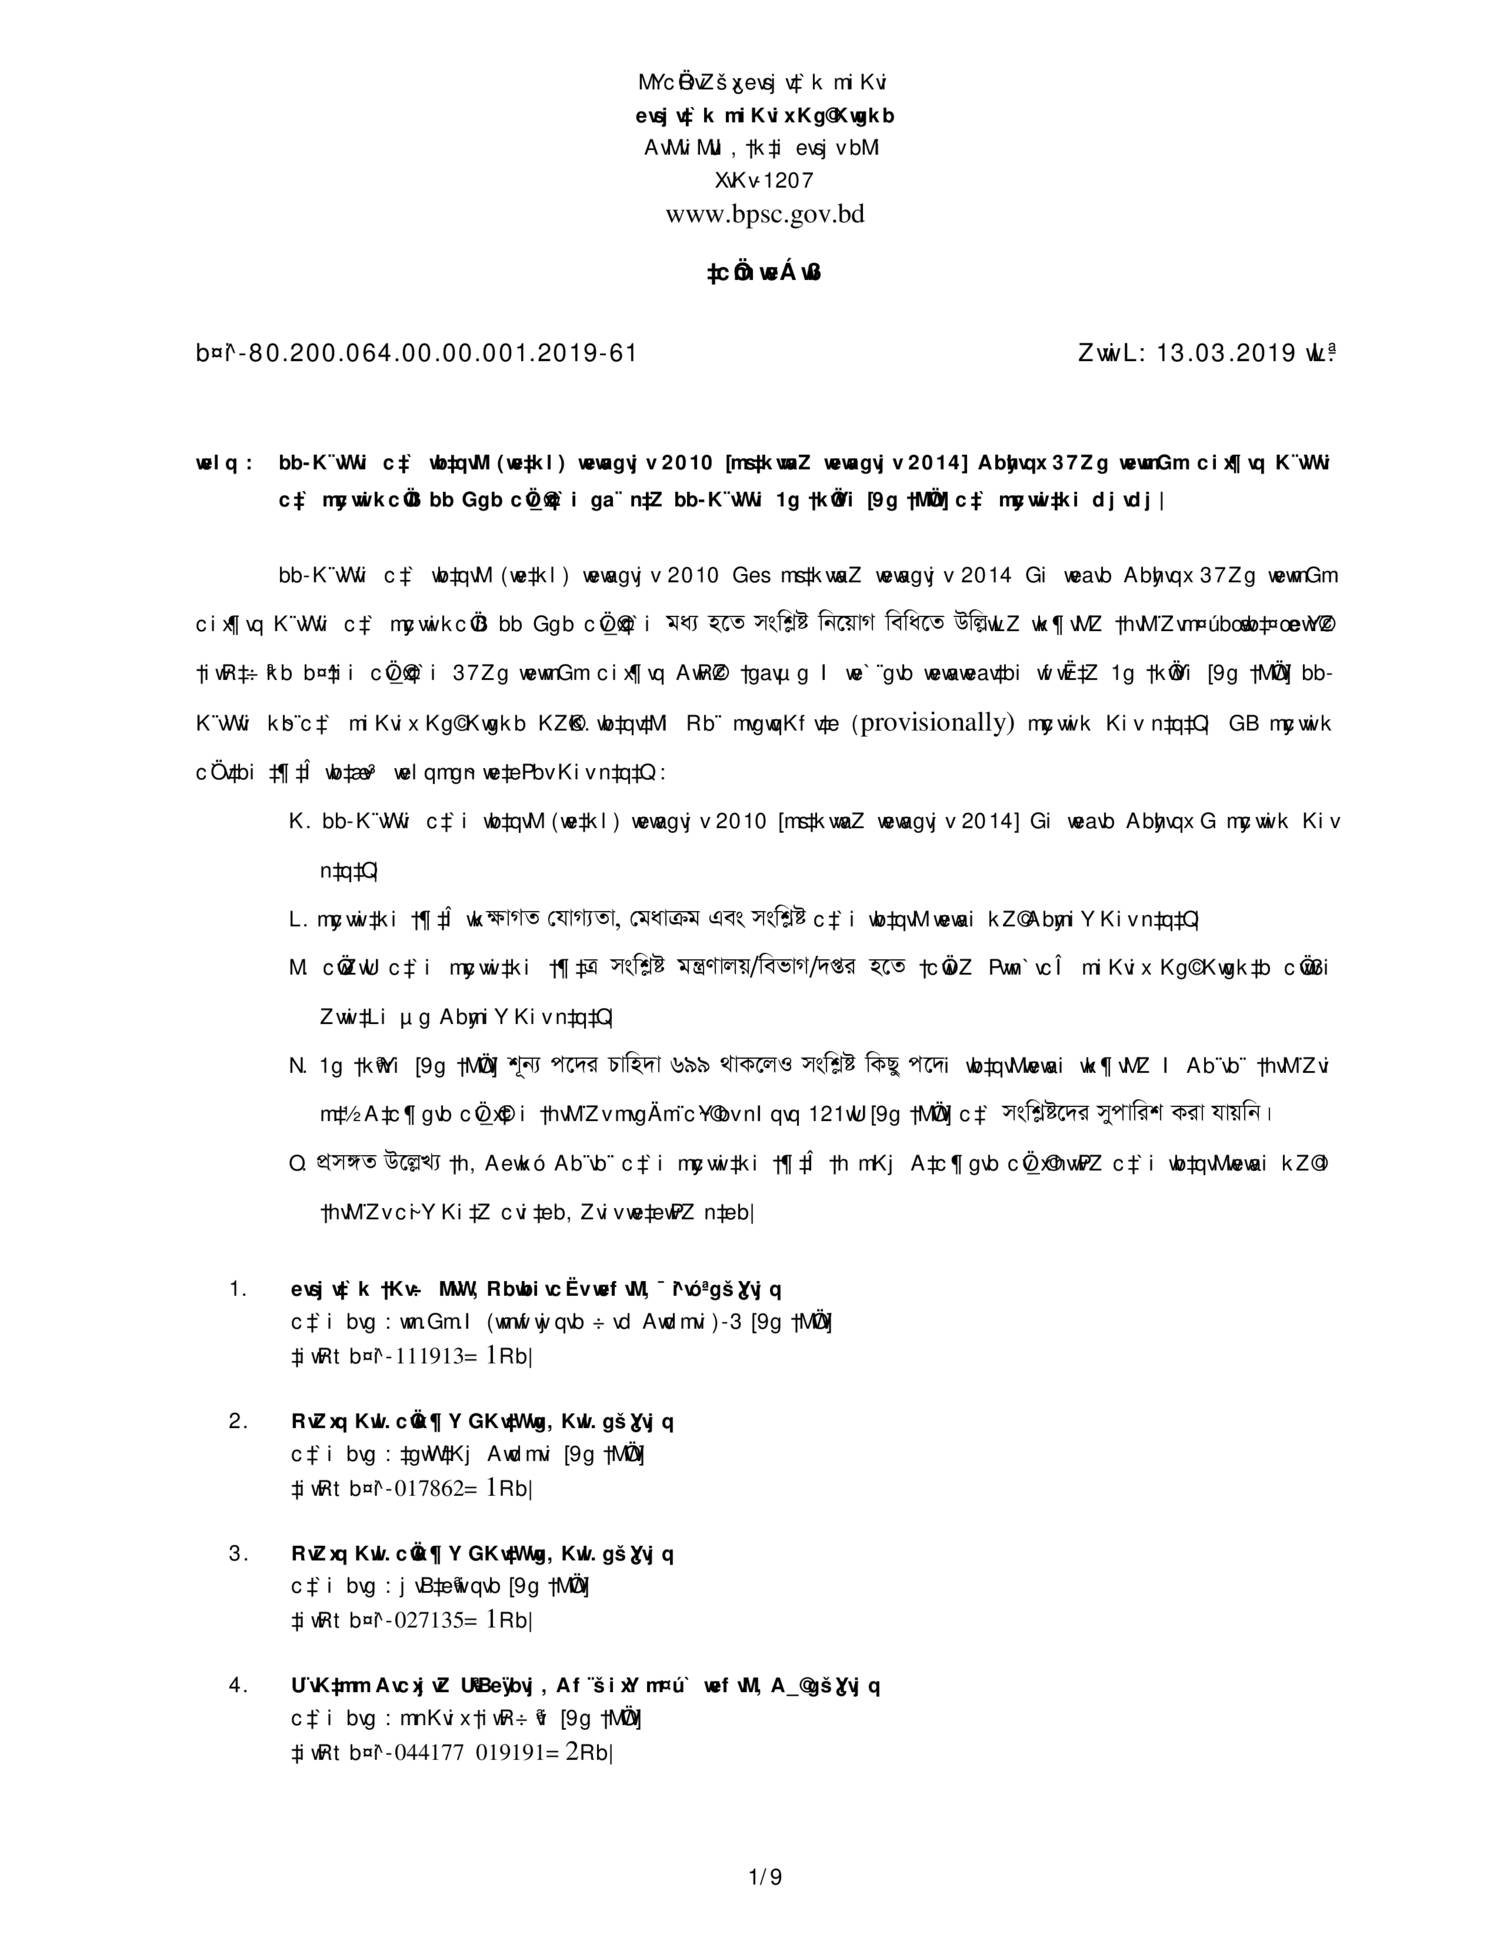 37 bcs non-cadre press reales pdf | DocDroid